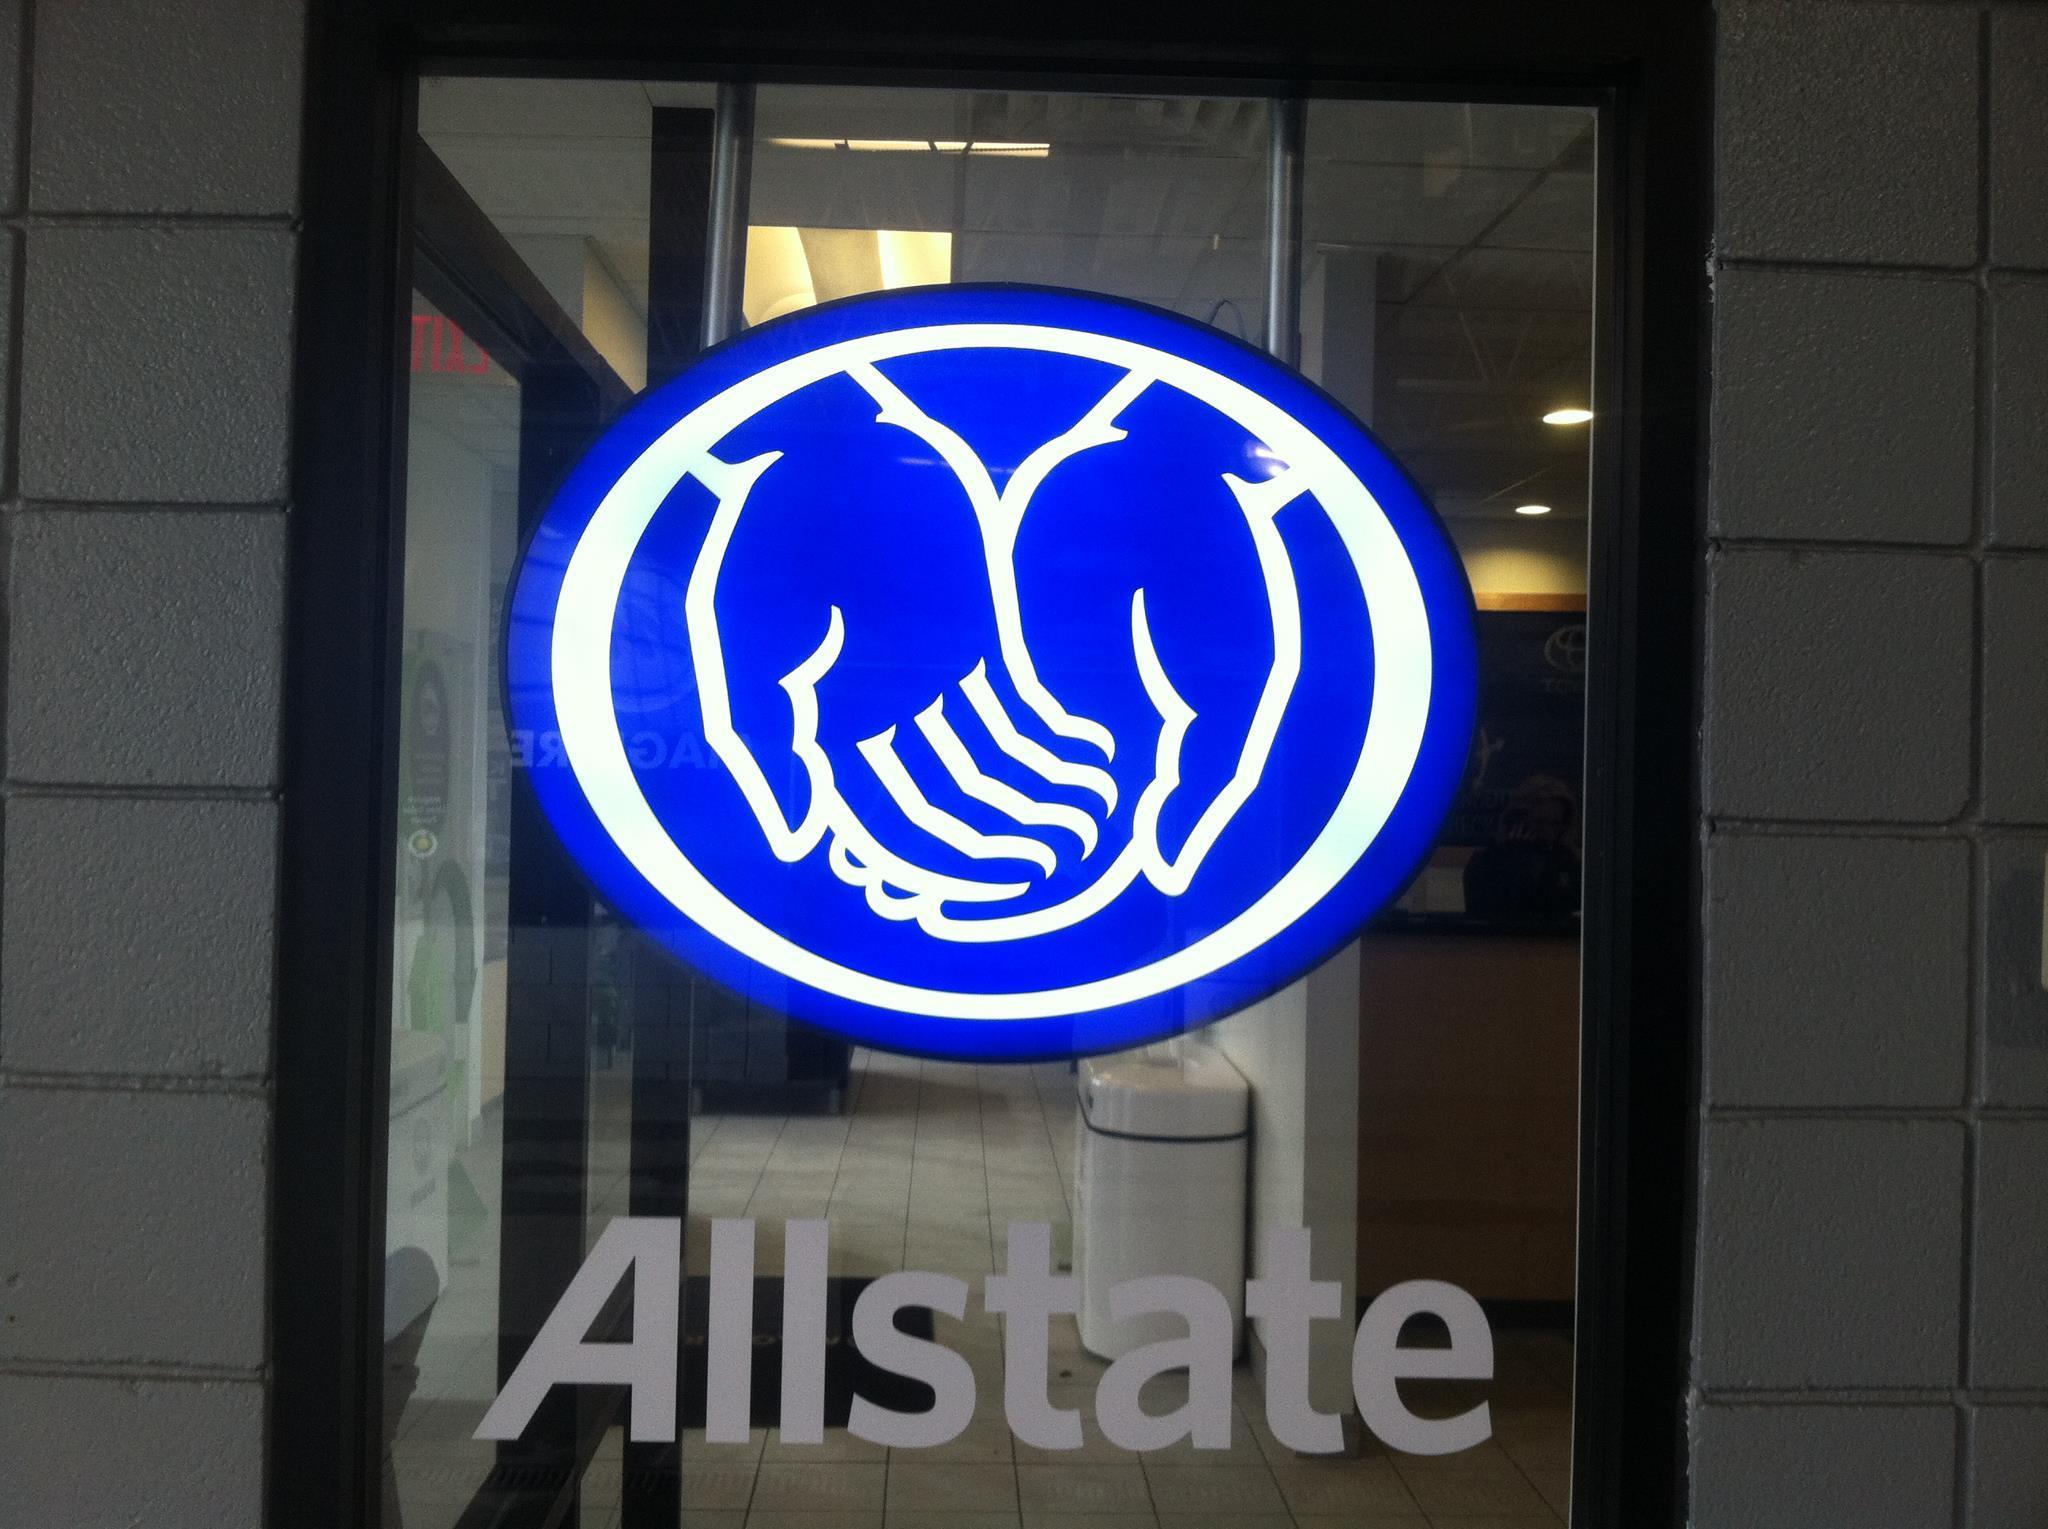 Philip Maguire: Allstate Insurance image 0